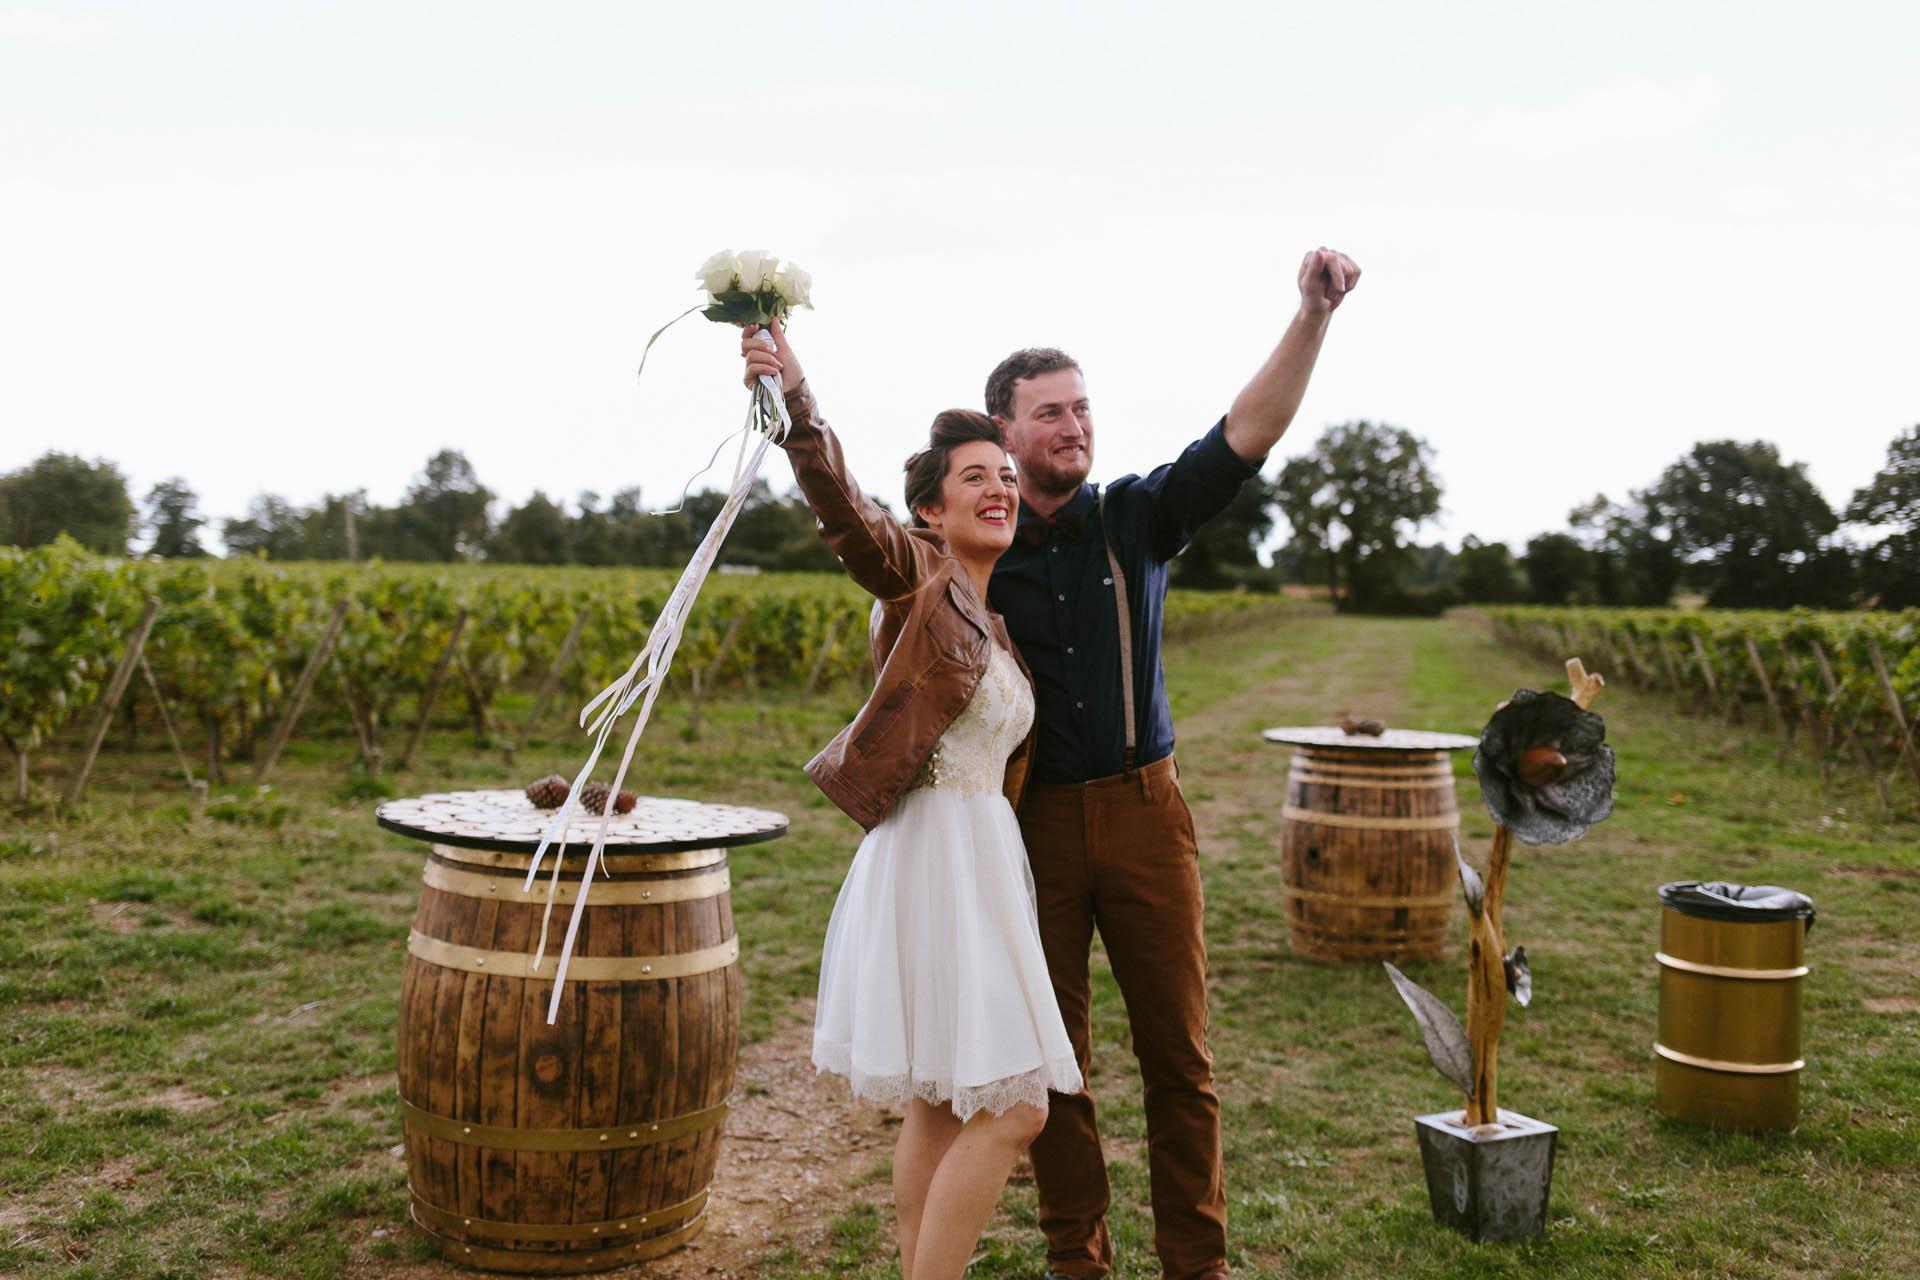 mariage_vignobles_mourat_vendee_jeremy_agathe_flavie_nelly-144